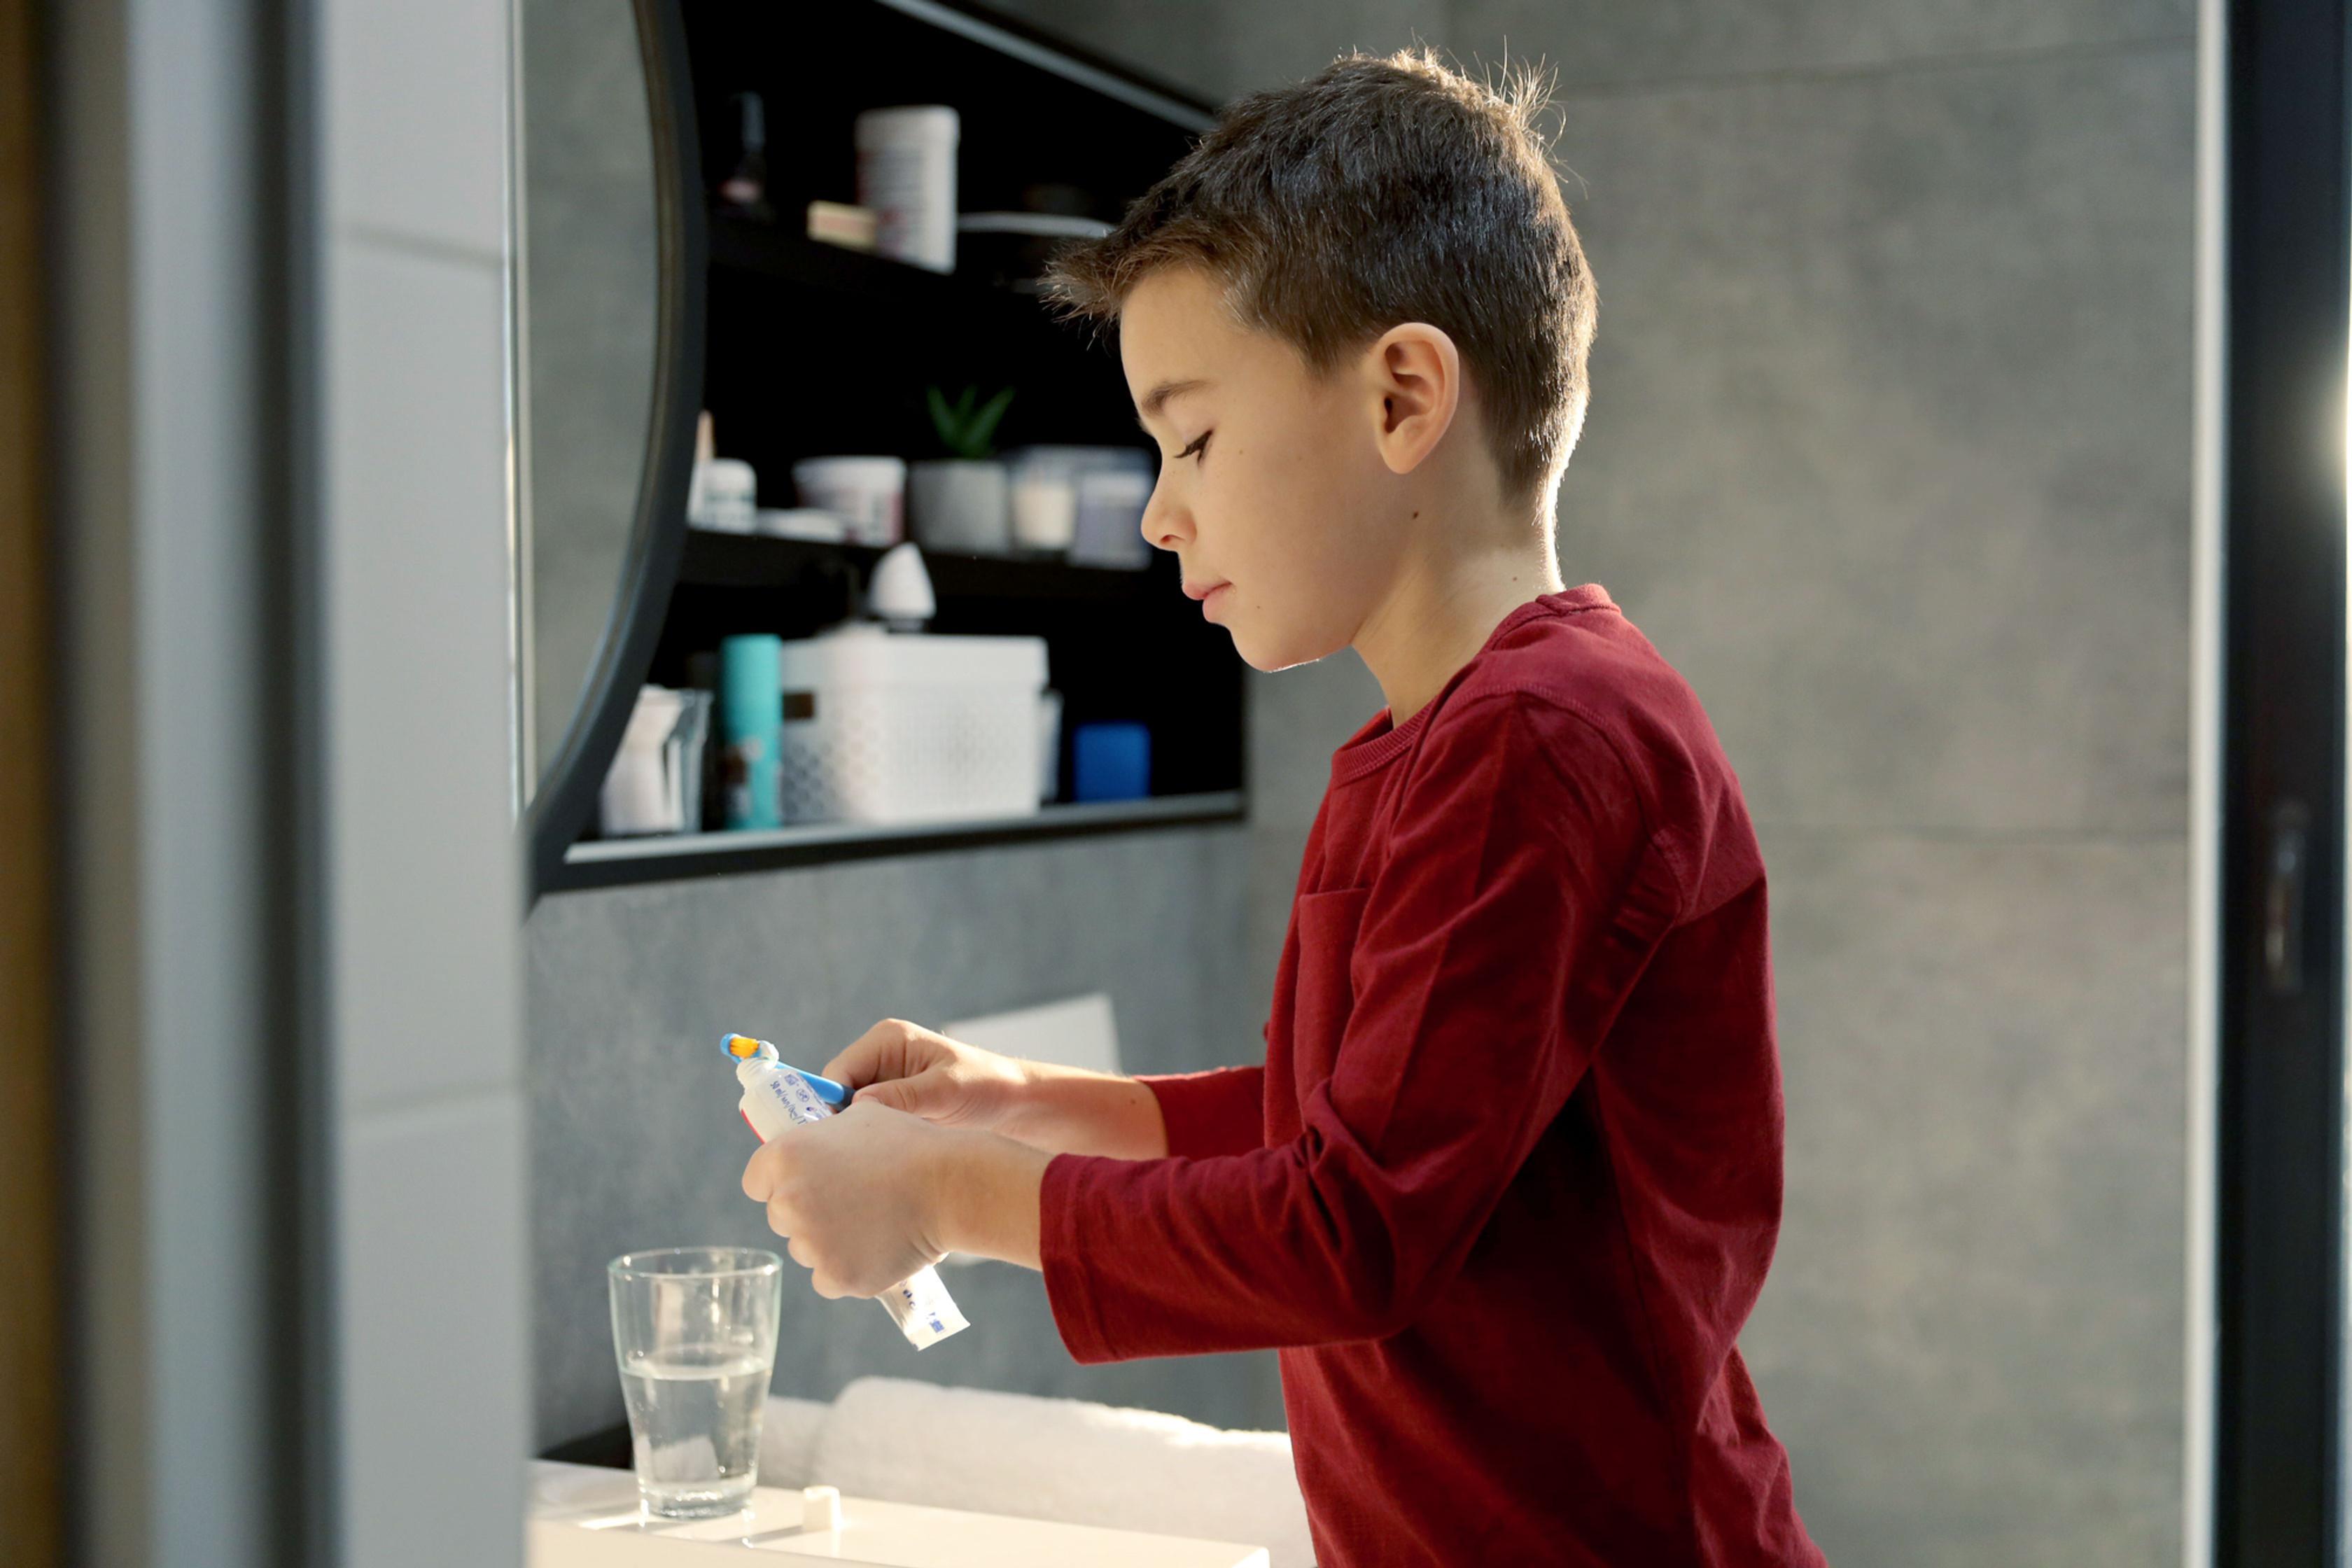 Coming Soon: Pediatric Dental Screenings